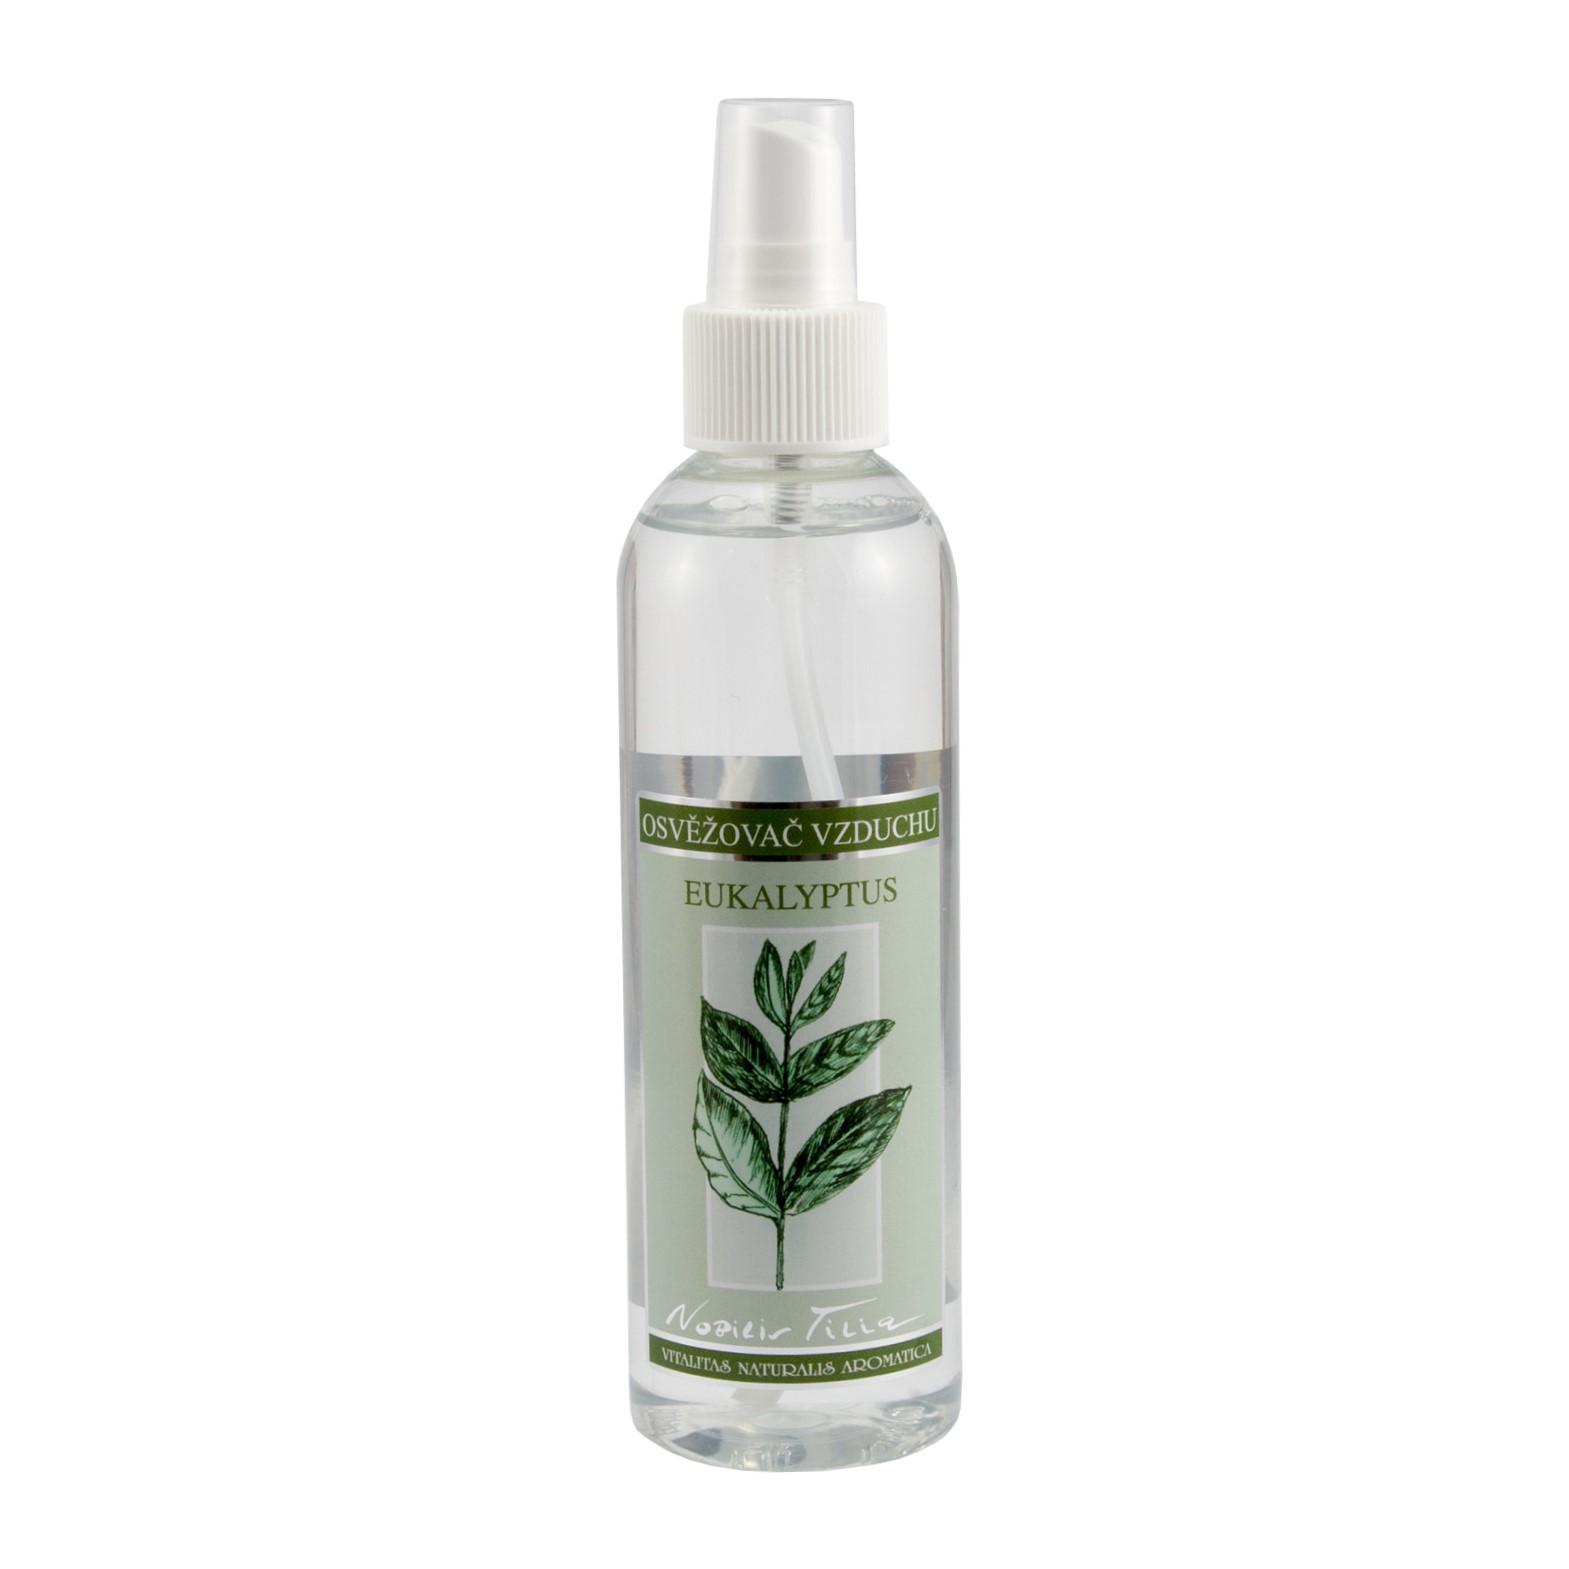 Nobilis Tilia Osvěžovač vzduchu eukalyptus 200 ml